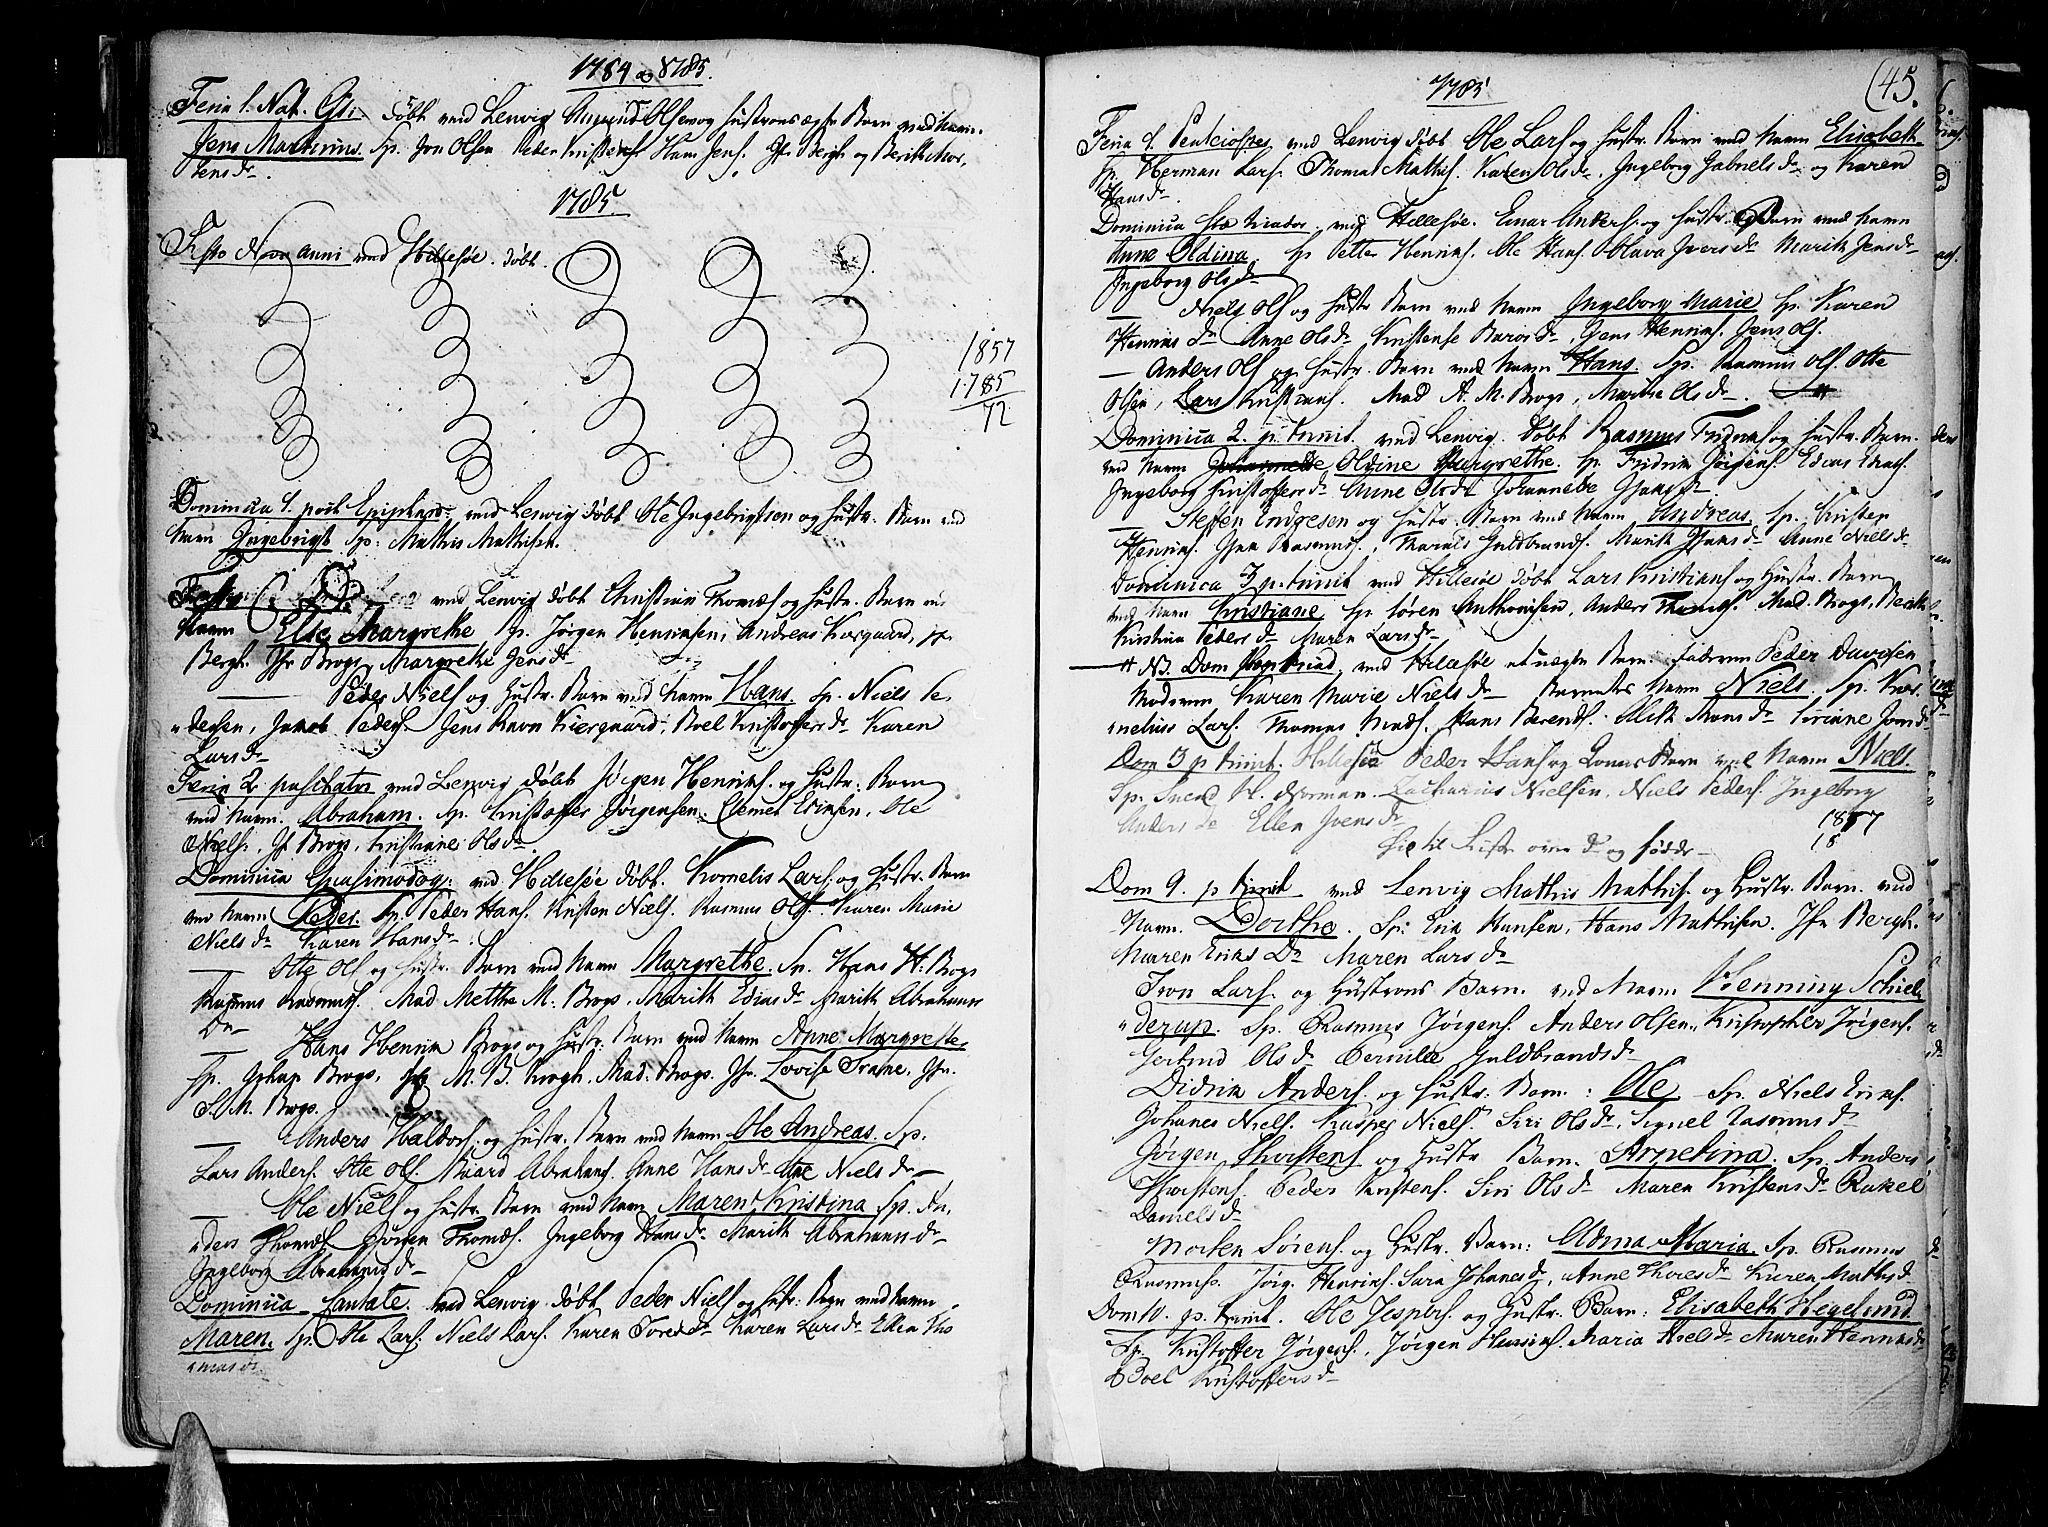 SATØ, Lenvik sokneprestembete, H/Ha/Haa/L0002kirke: Ministerialbok nr. 2, 1784-1820, s. 45